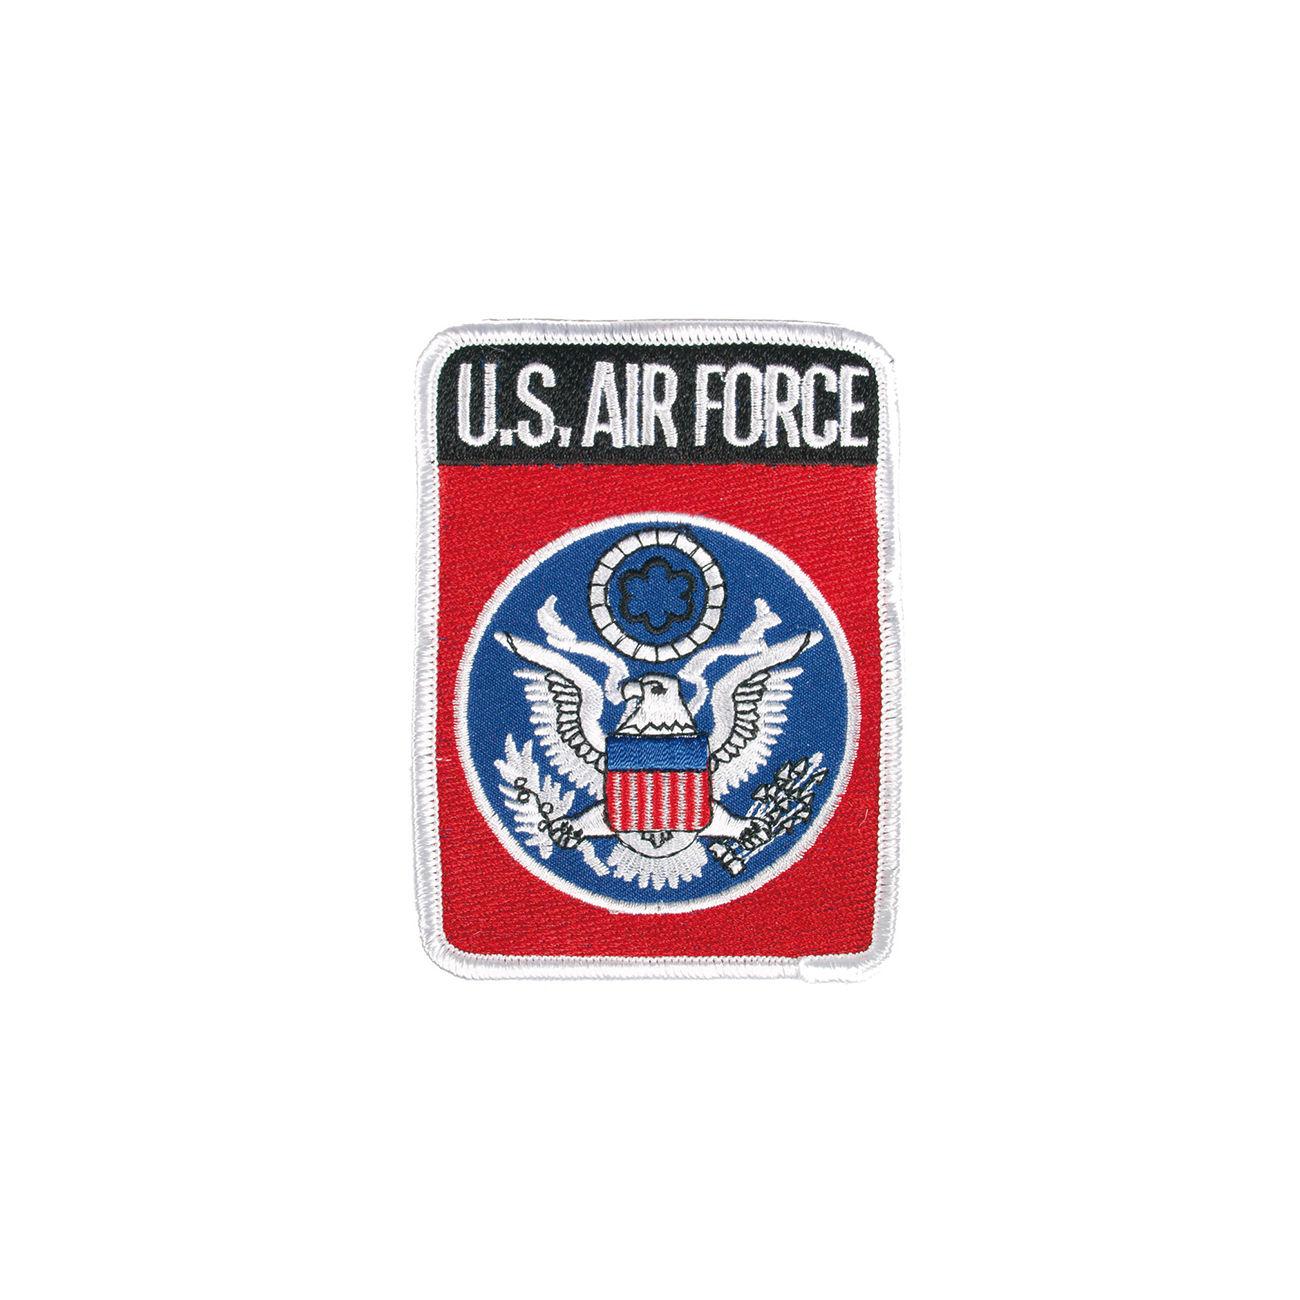 Textil Patch US Air Force Mit Bugelflache